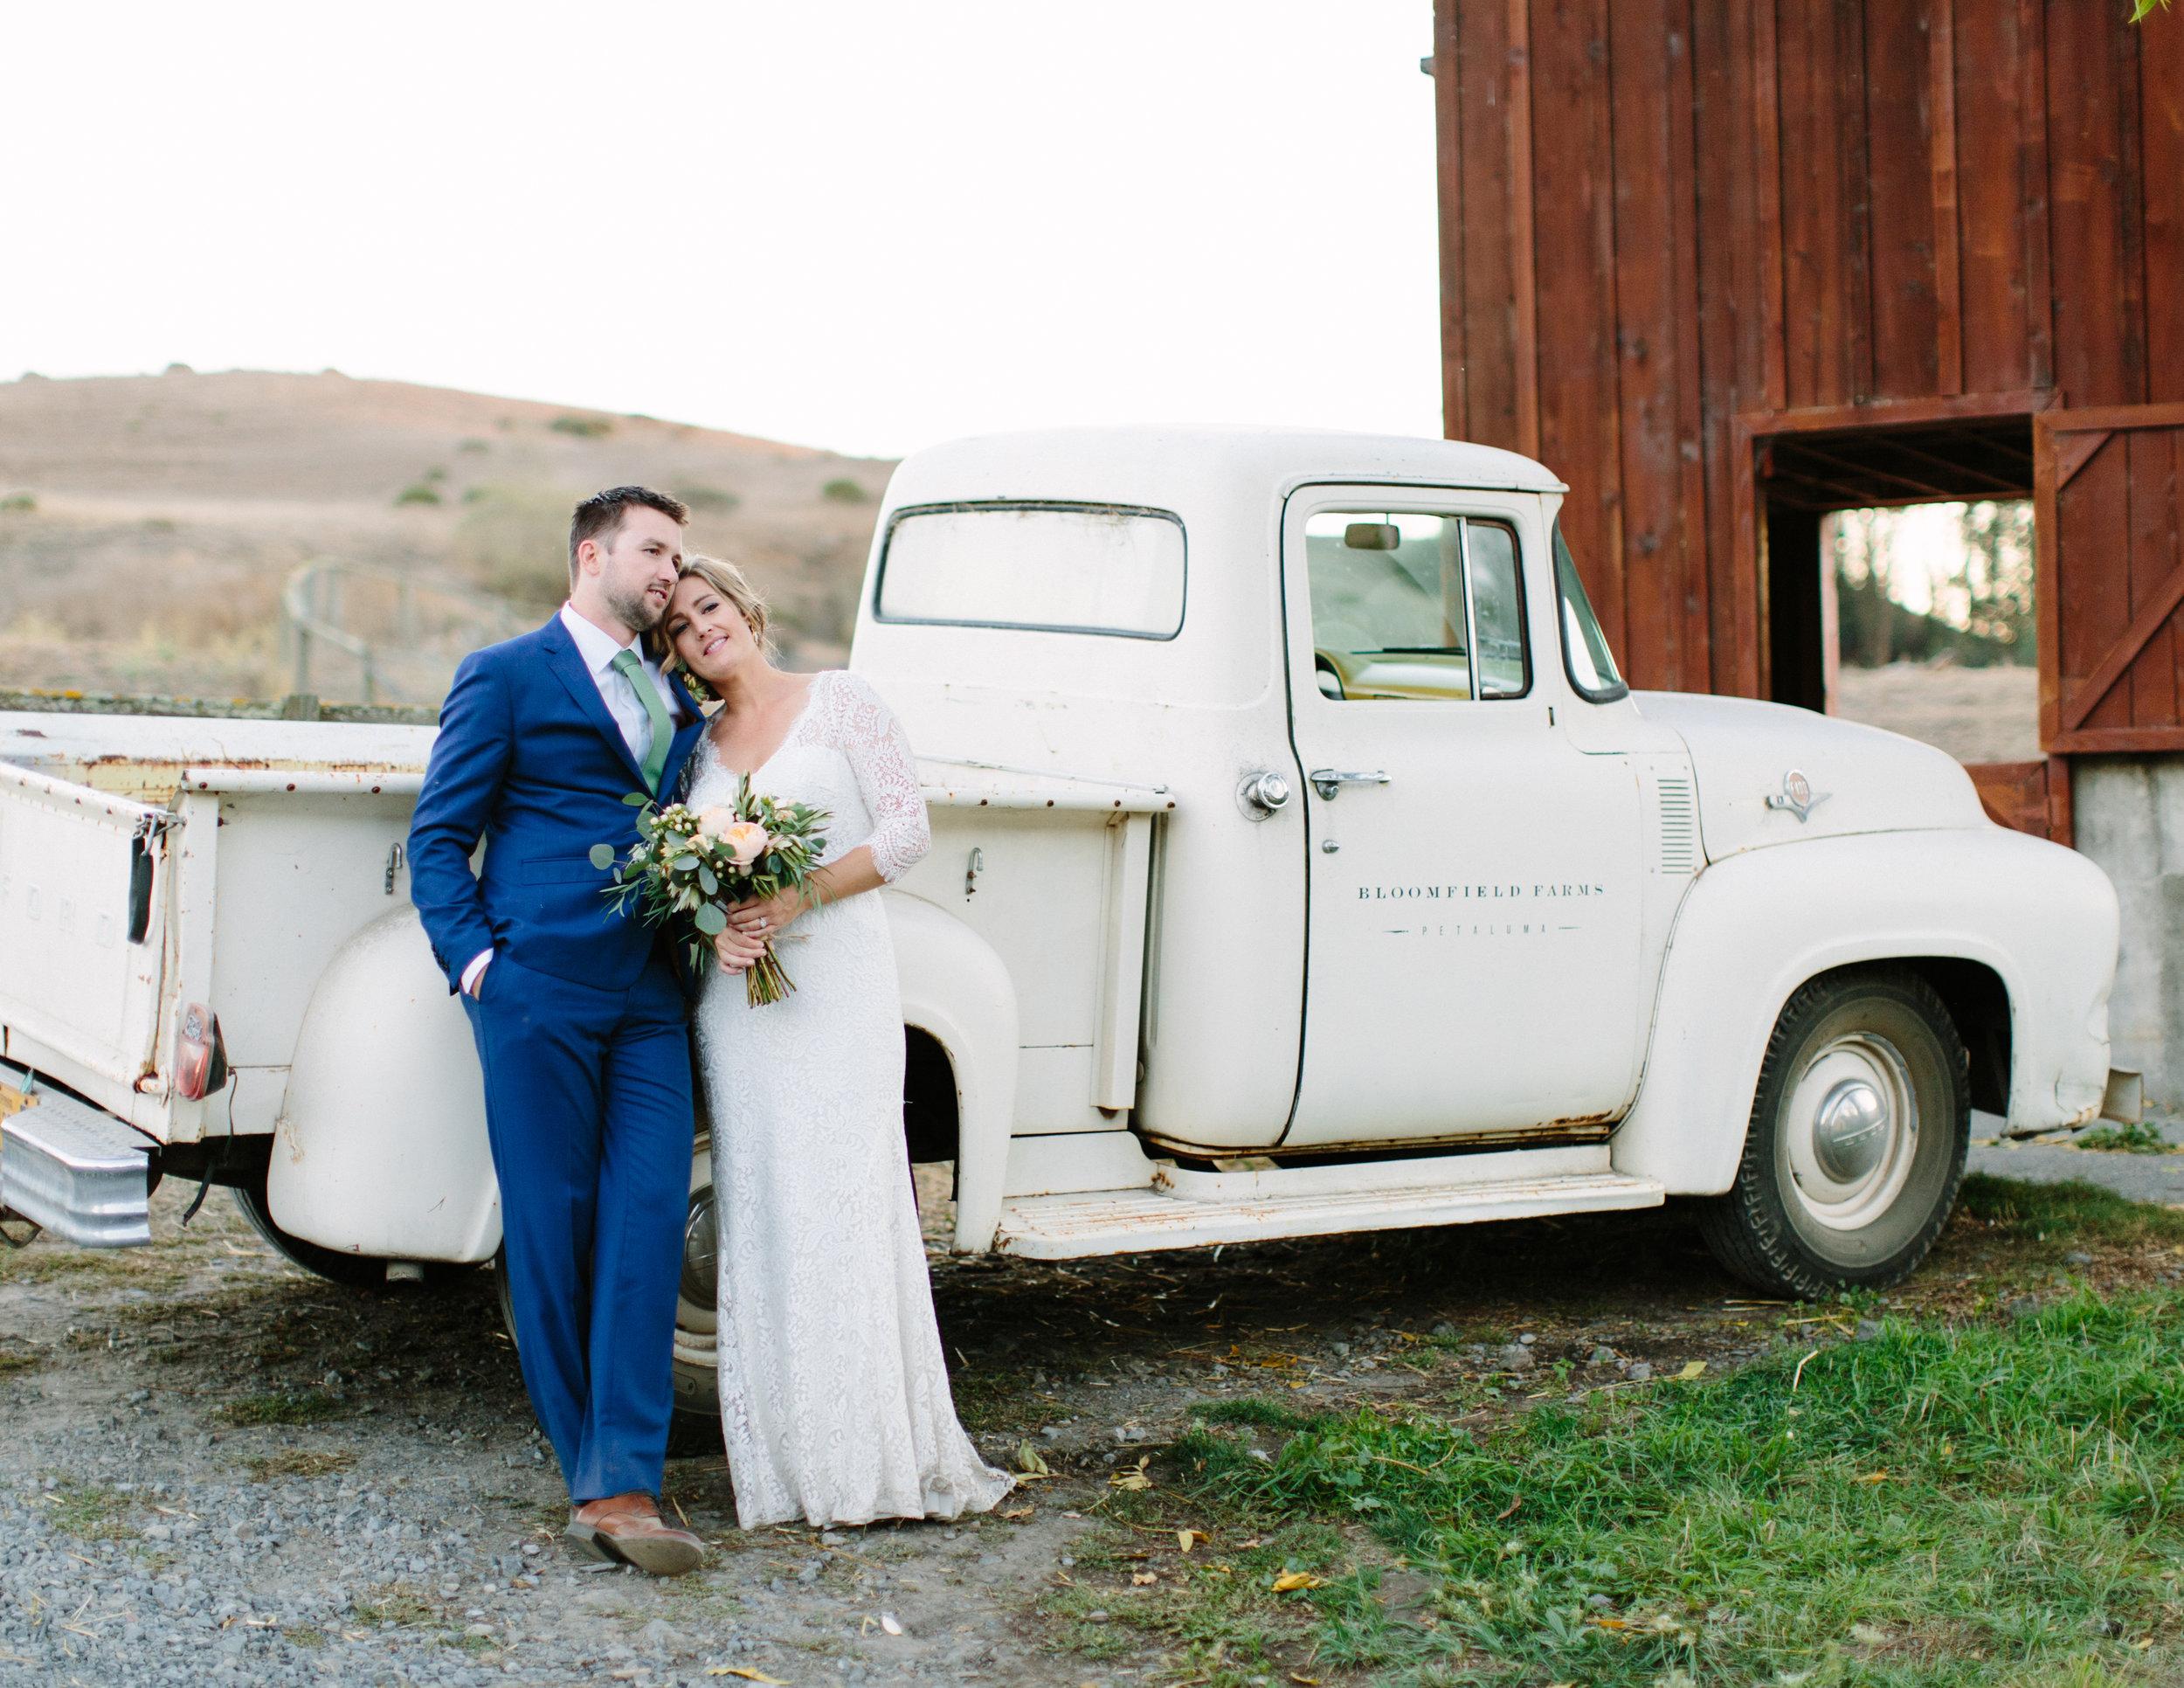 bloomfield farms wedding 1.jpg